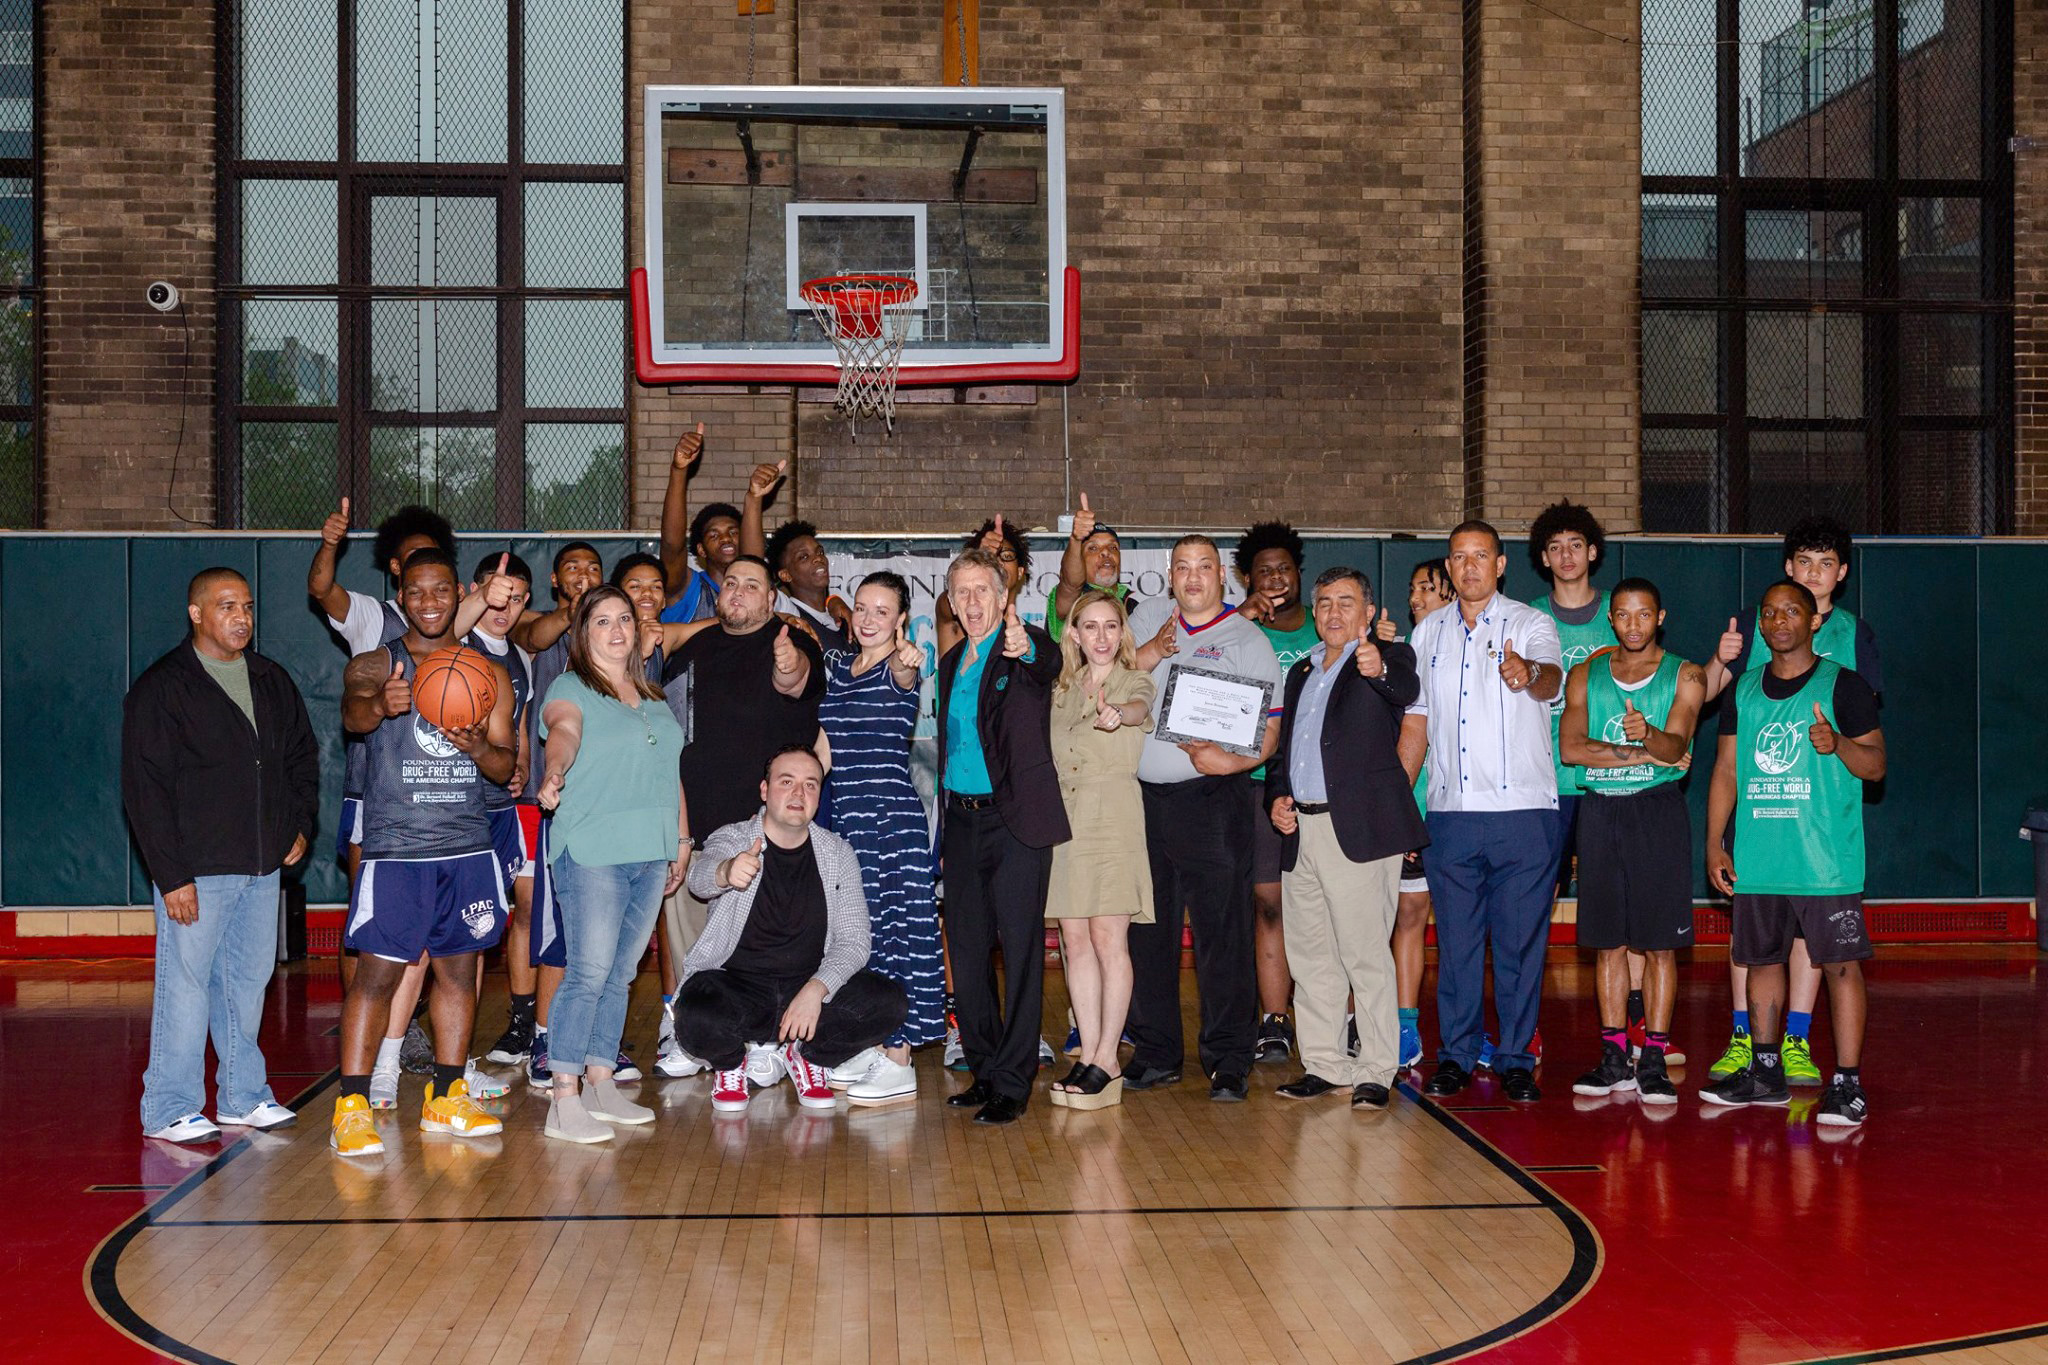 2nd-Annual-Drug-Free-Basketball-Tournament-02.jpg